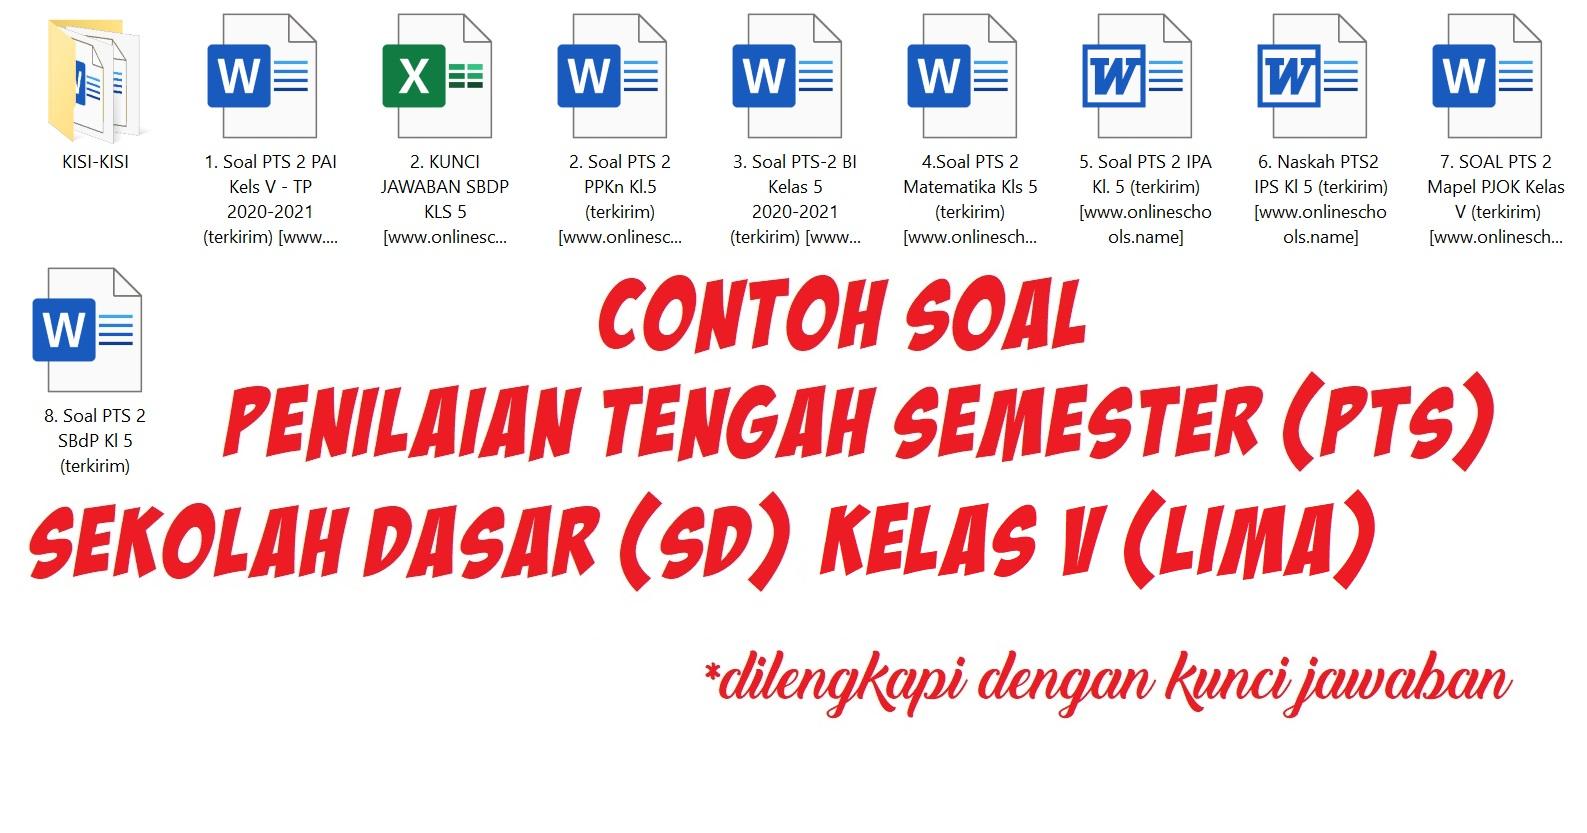 Contoh Soal Penilaian Tengah Semester (PTS) Sekolah Dasar (SD) Kelas V (Lima)